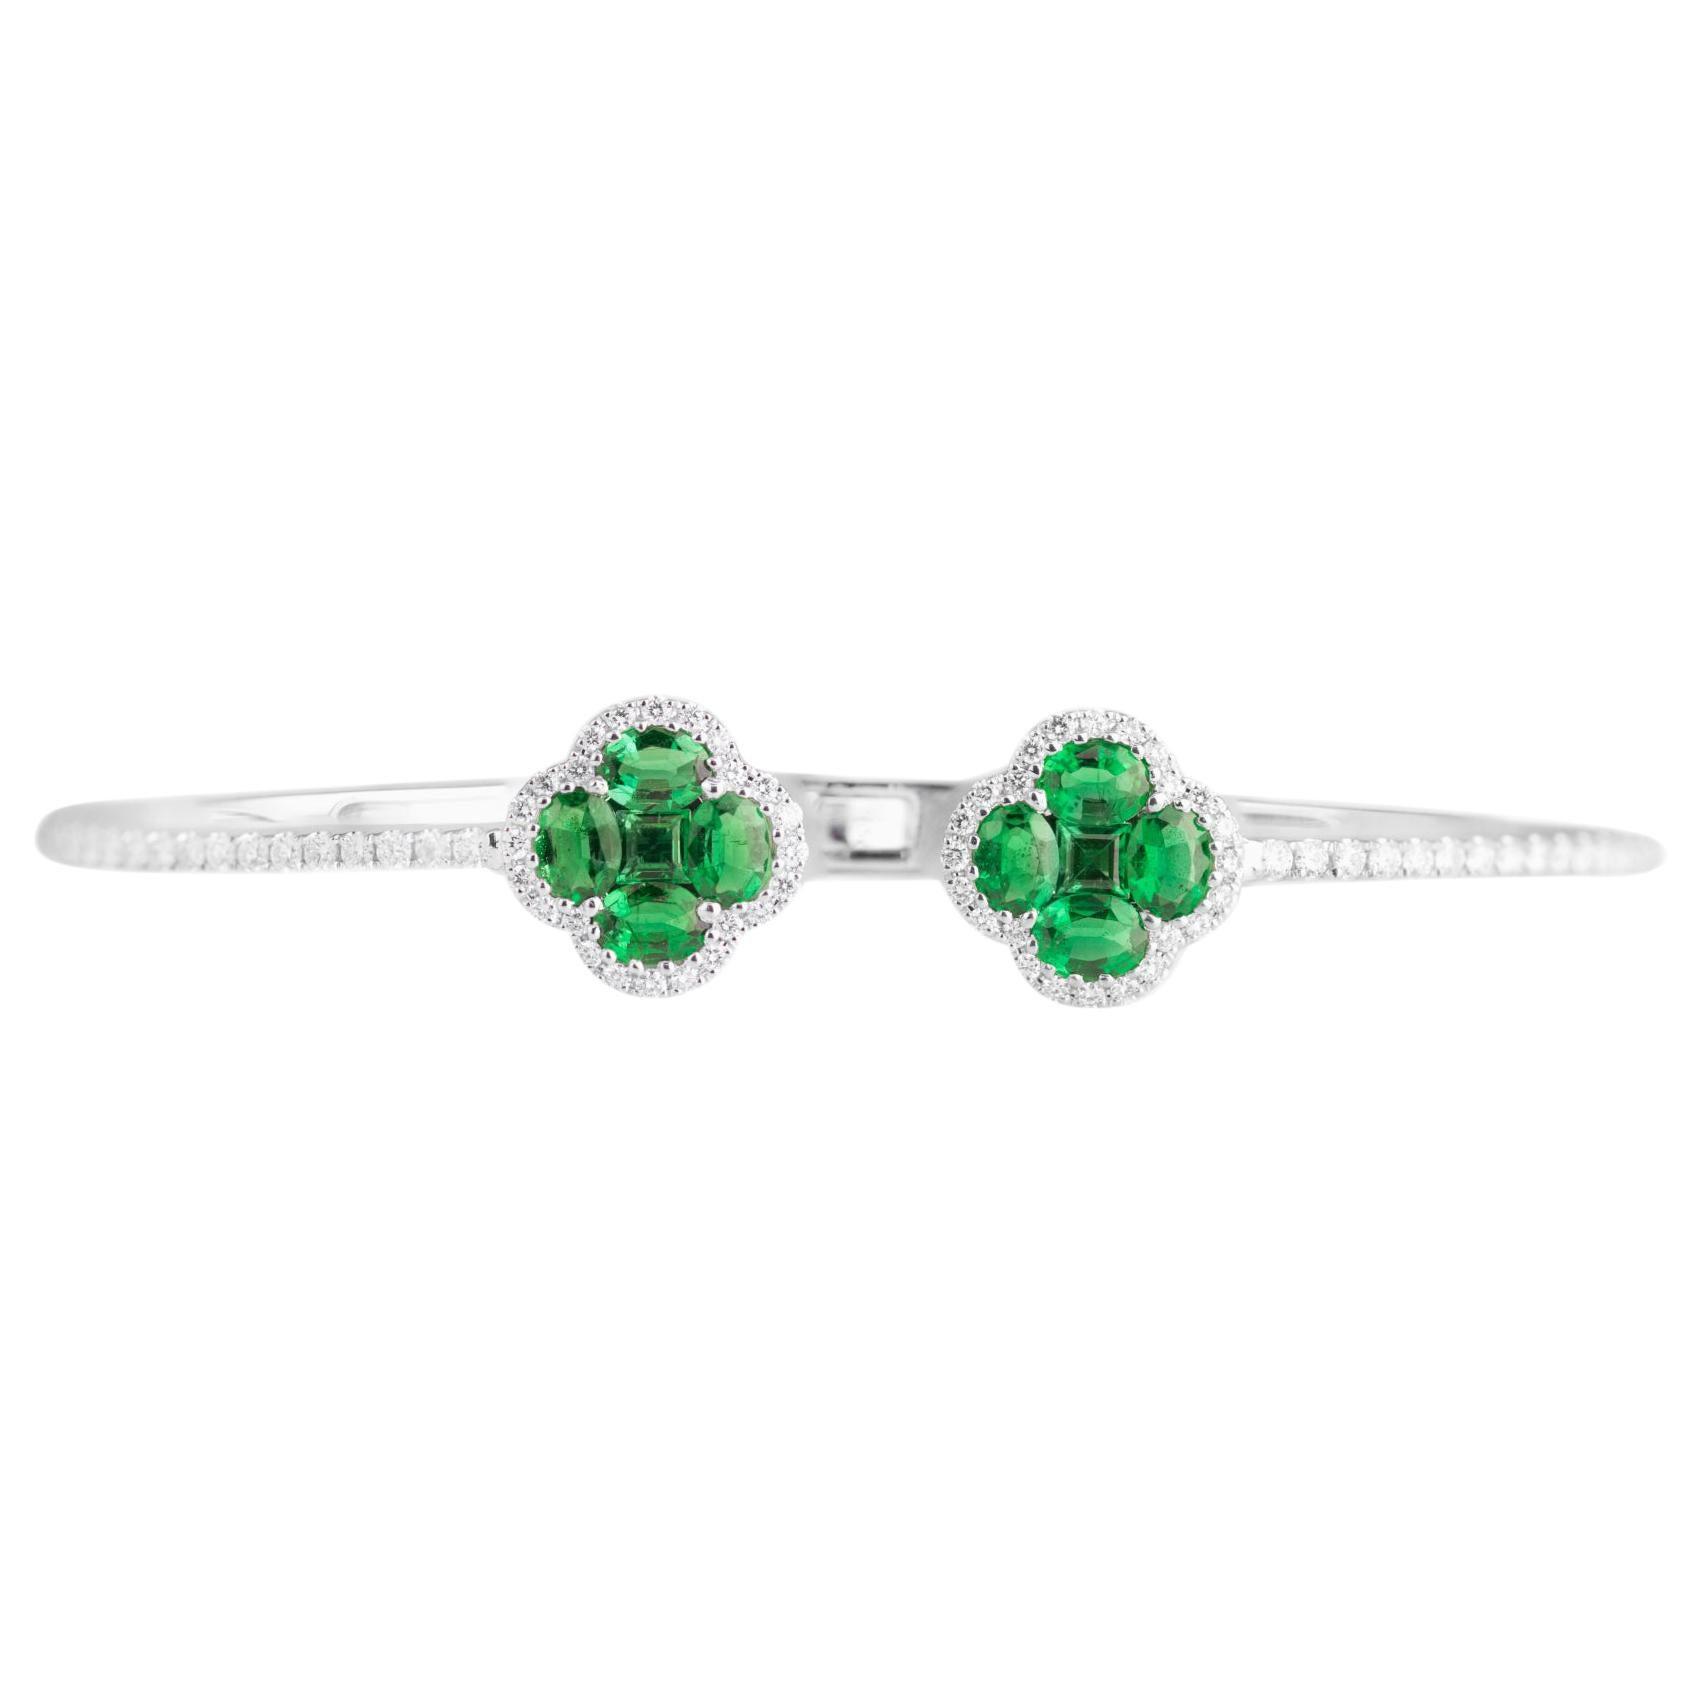 DiamondTown 1.33 Carat Emerald Clover and Diamond Bangle in 18k White Gold